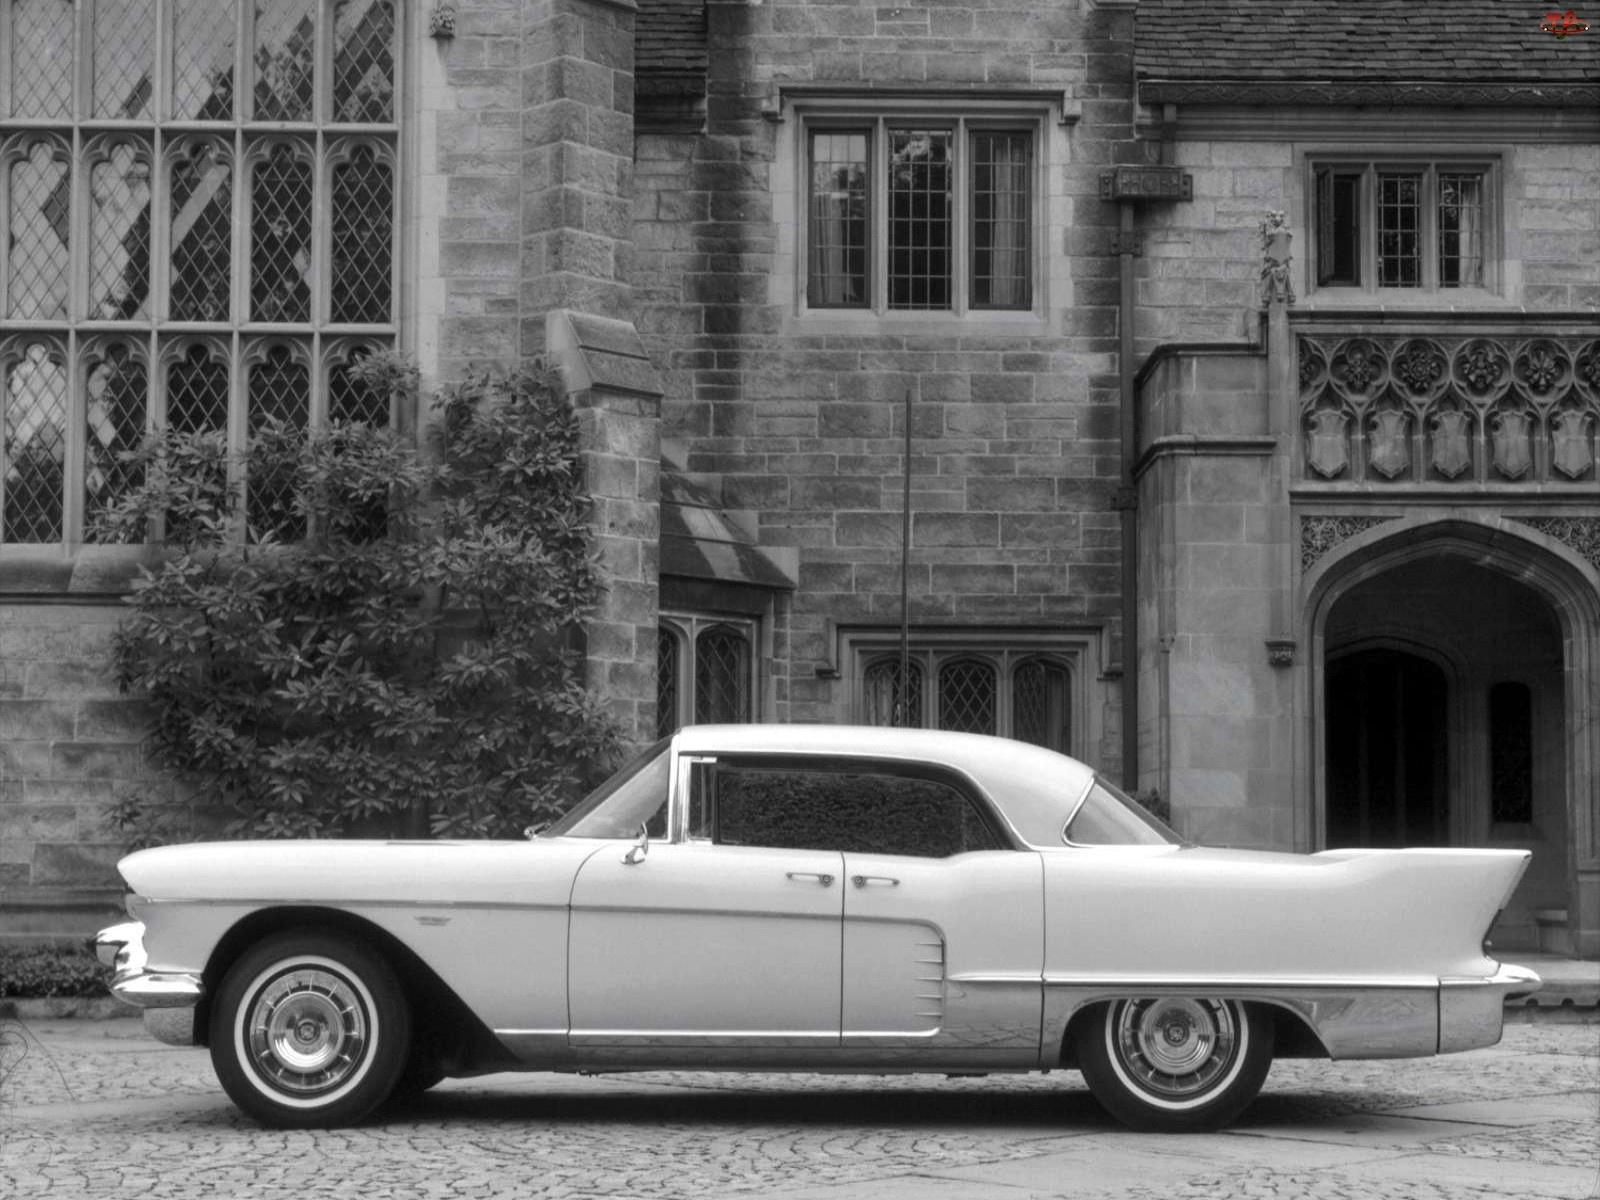 Cadillac Eldorado, Skrzydła